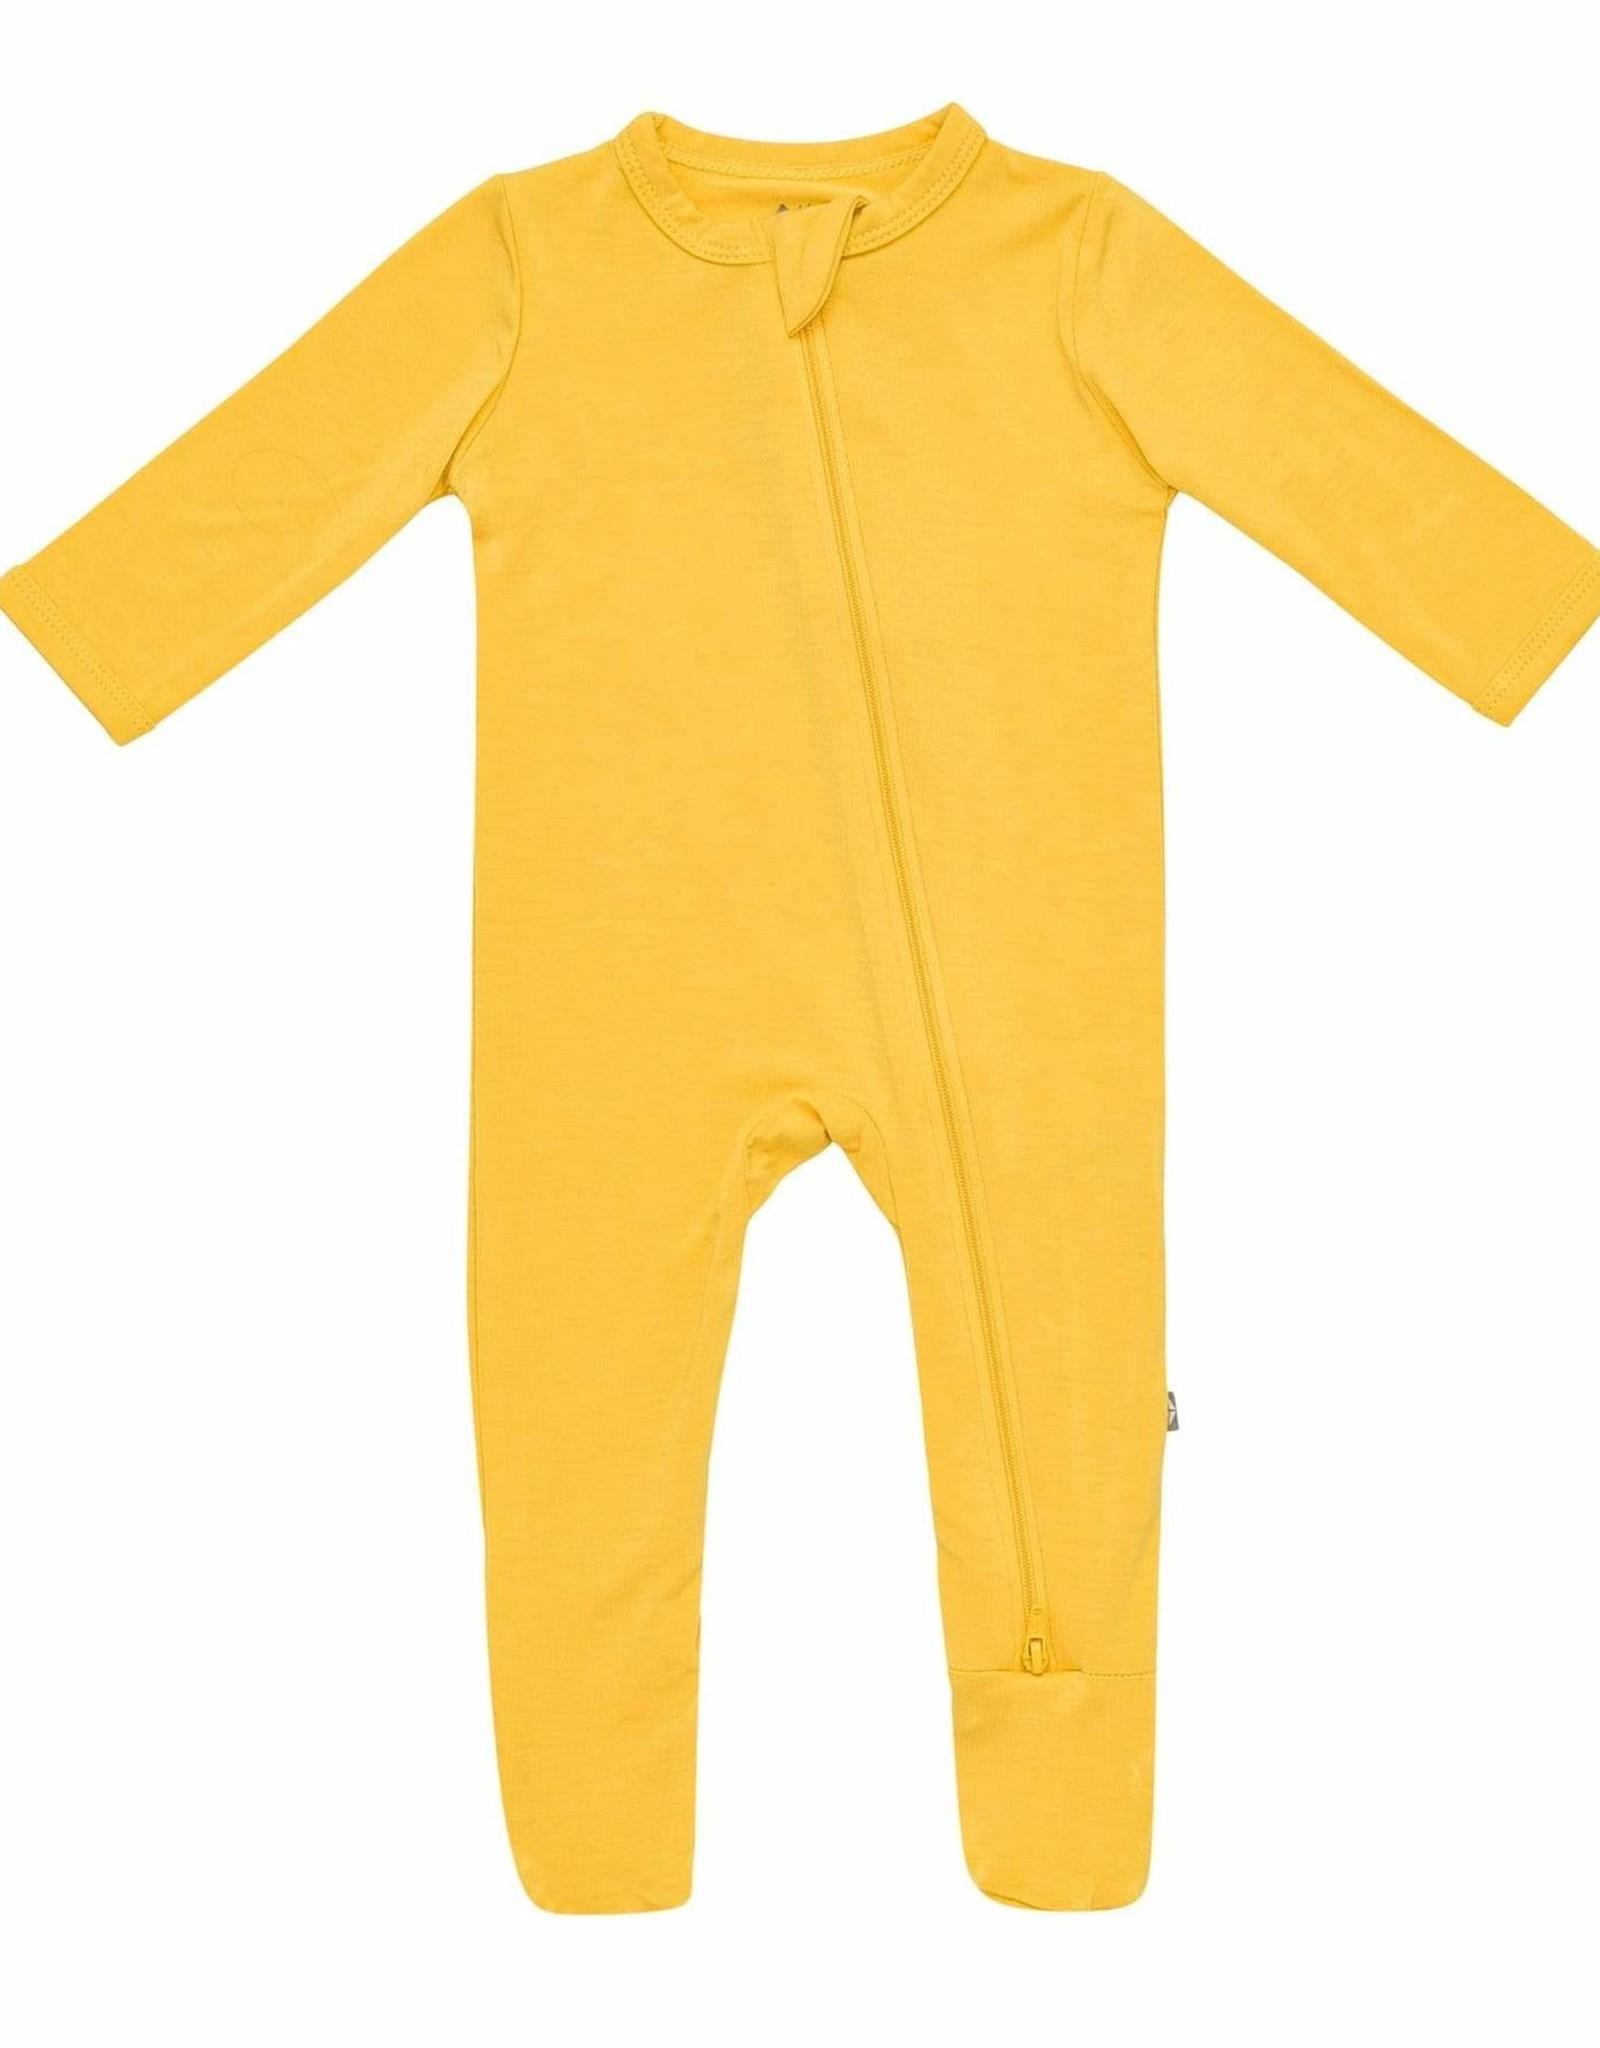 Kyte Baby zippered footie- pineapple